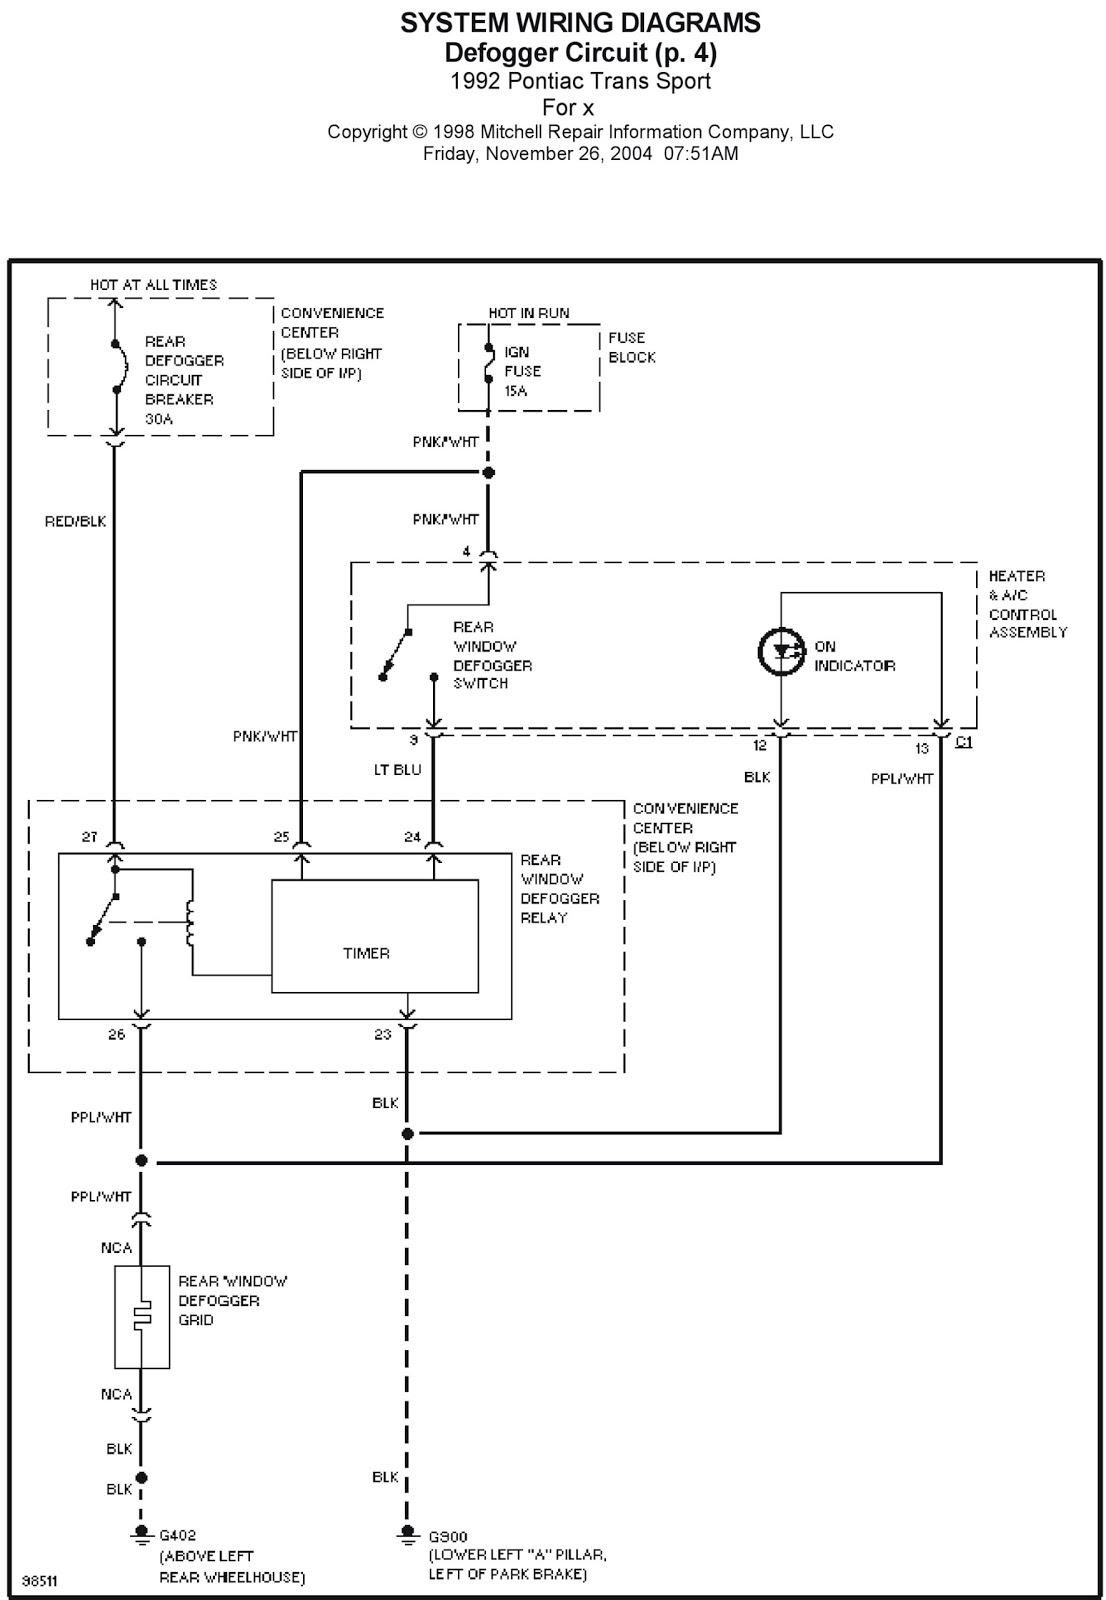 2004 pontiac sunfire stereo wiring diagram hps transformer 1997 transport radio